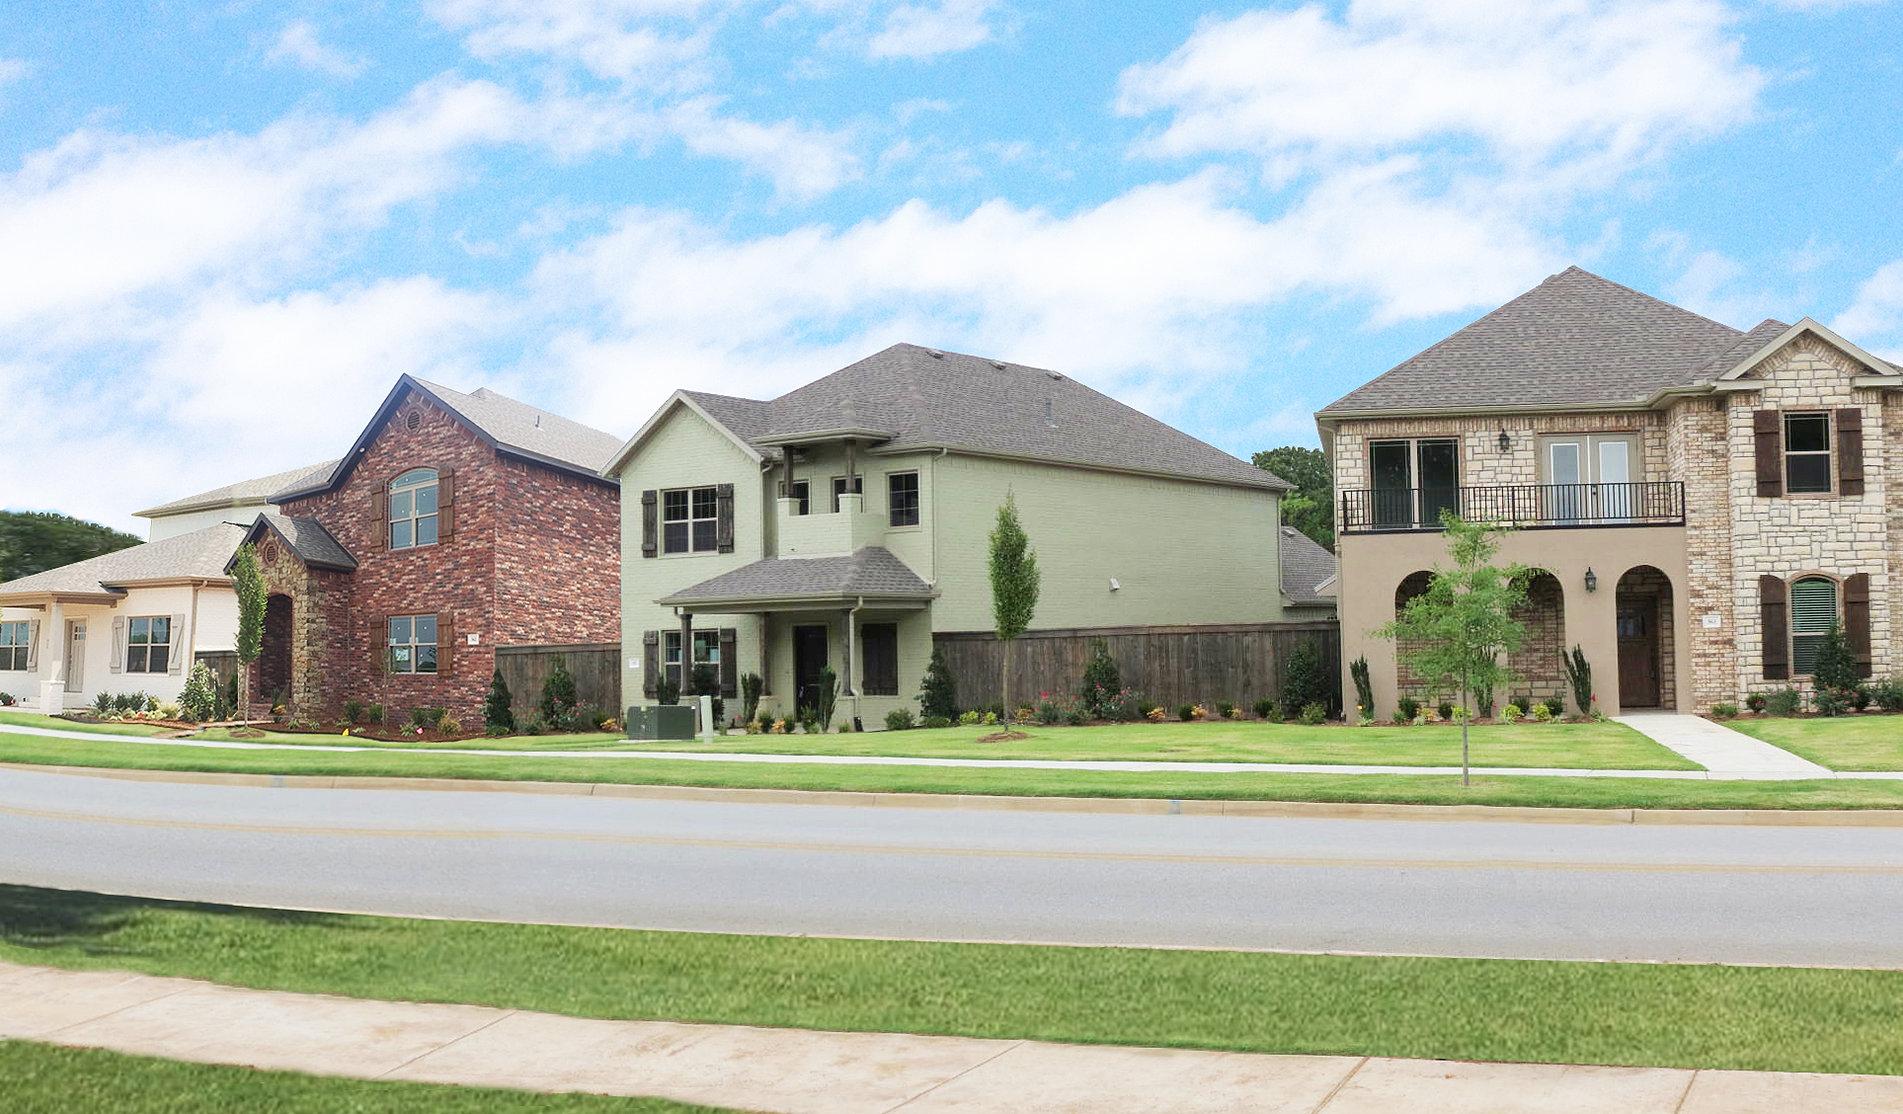 Northwest Arkansas Trademark Homes